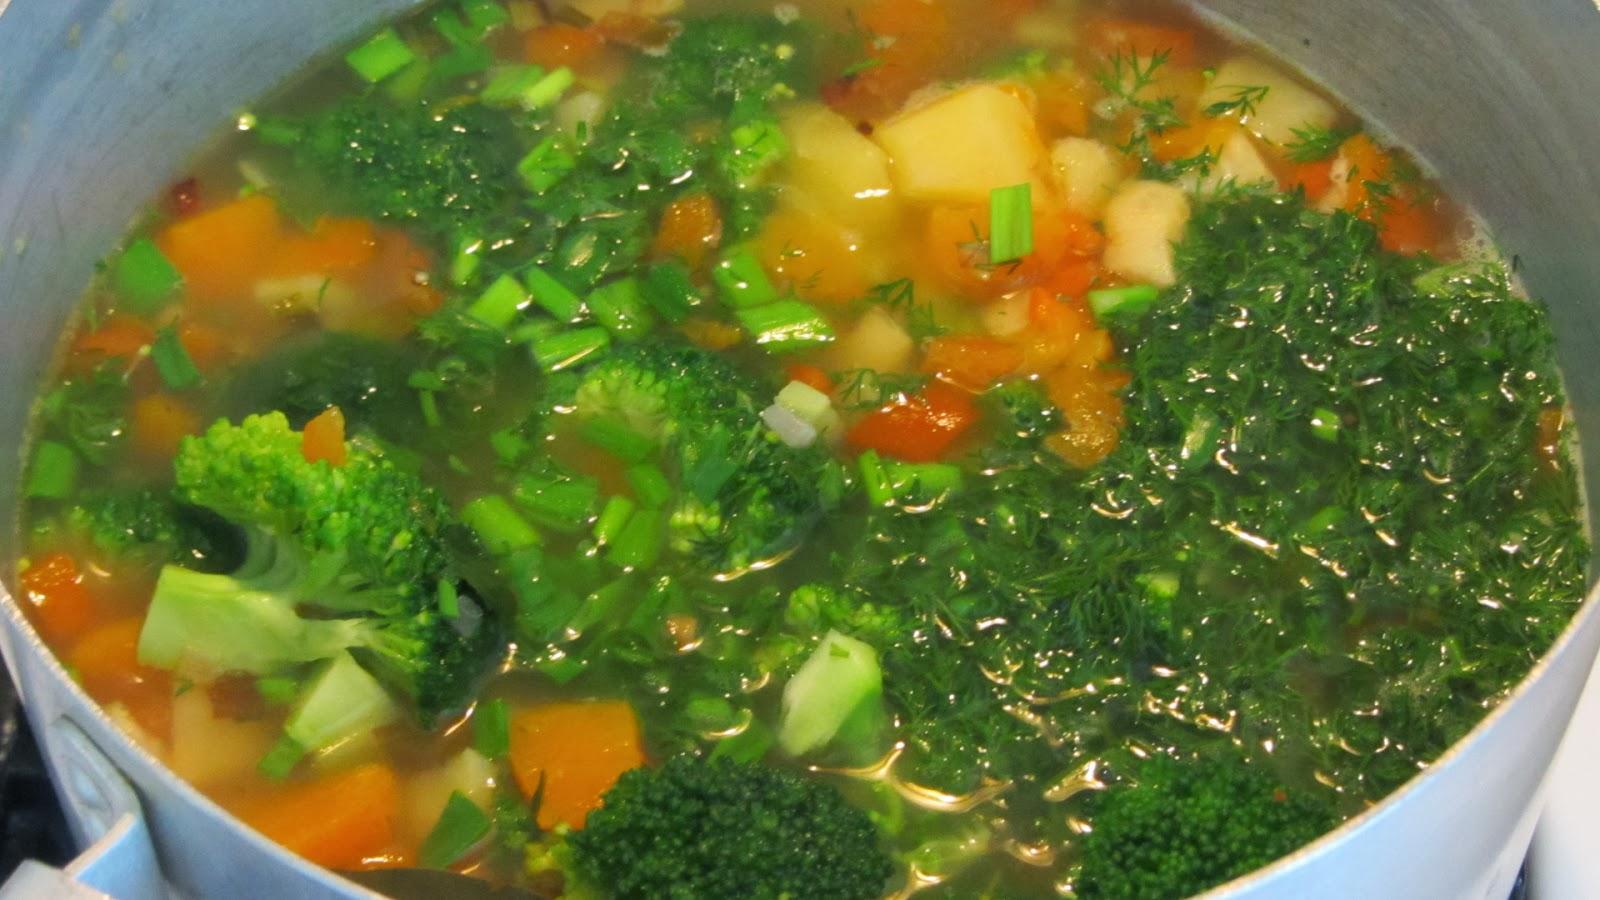 суп из брокколи готов